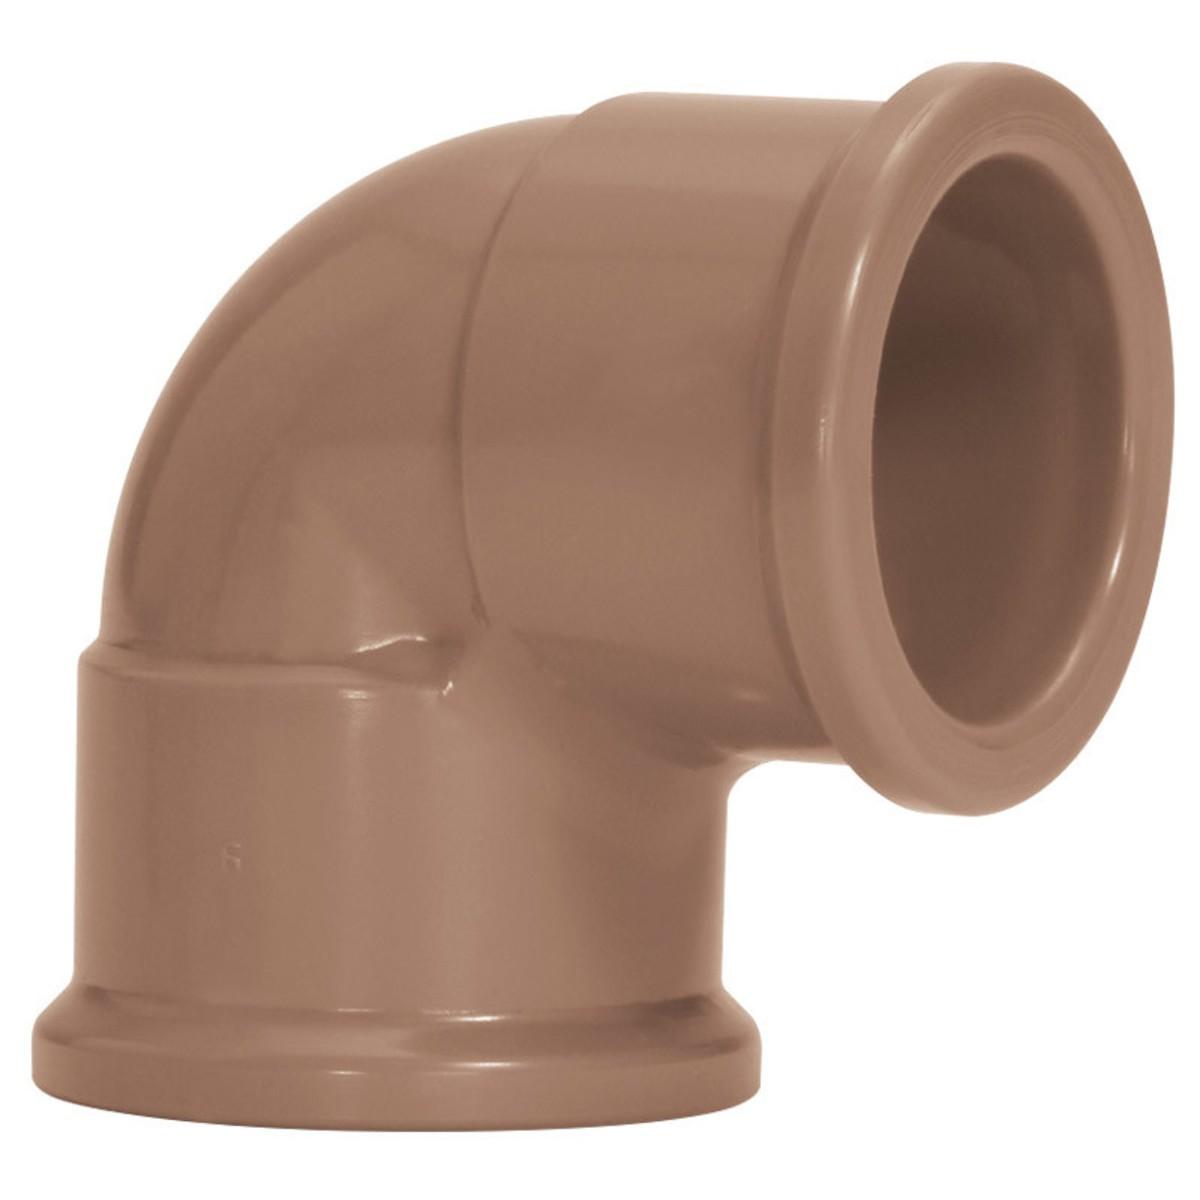 Joelho 90 Soldavel PVC Marrom 25 mm - Amanco